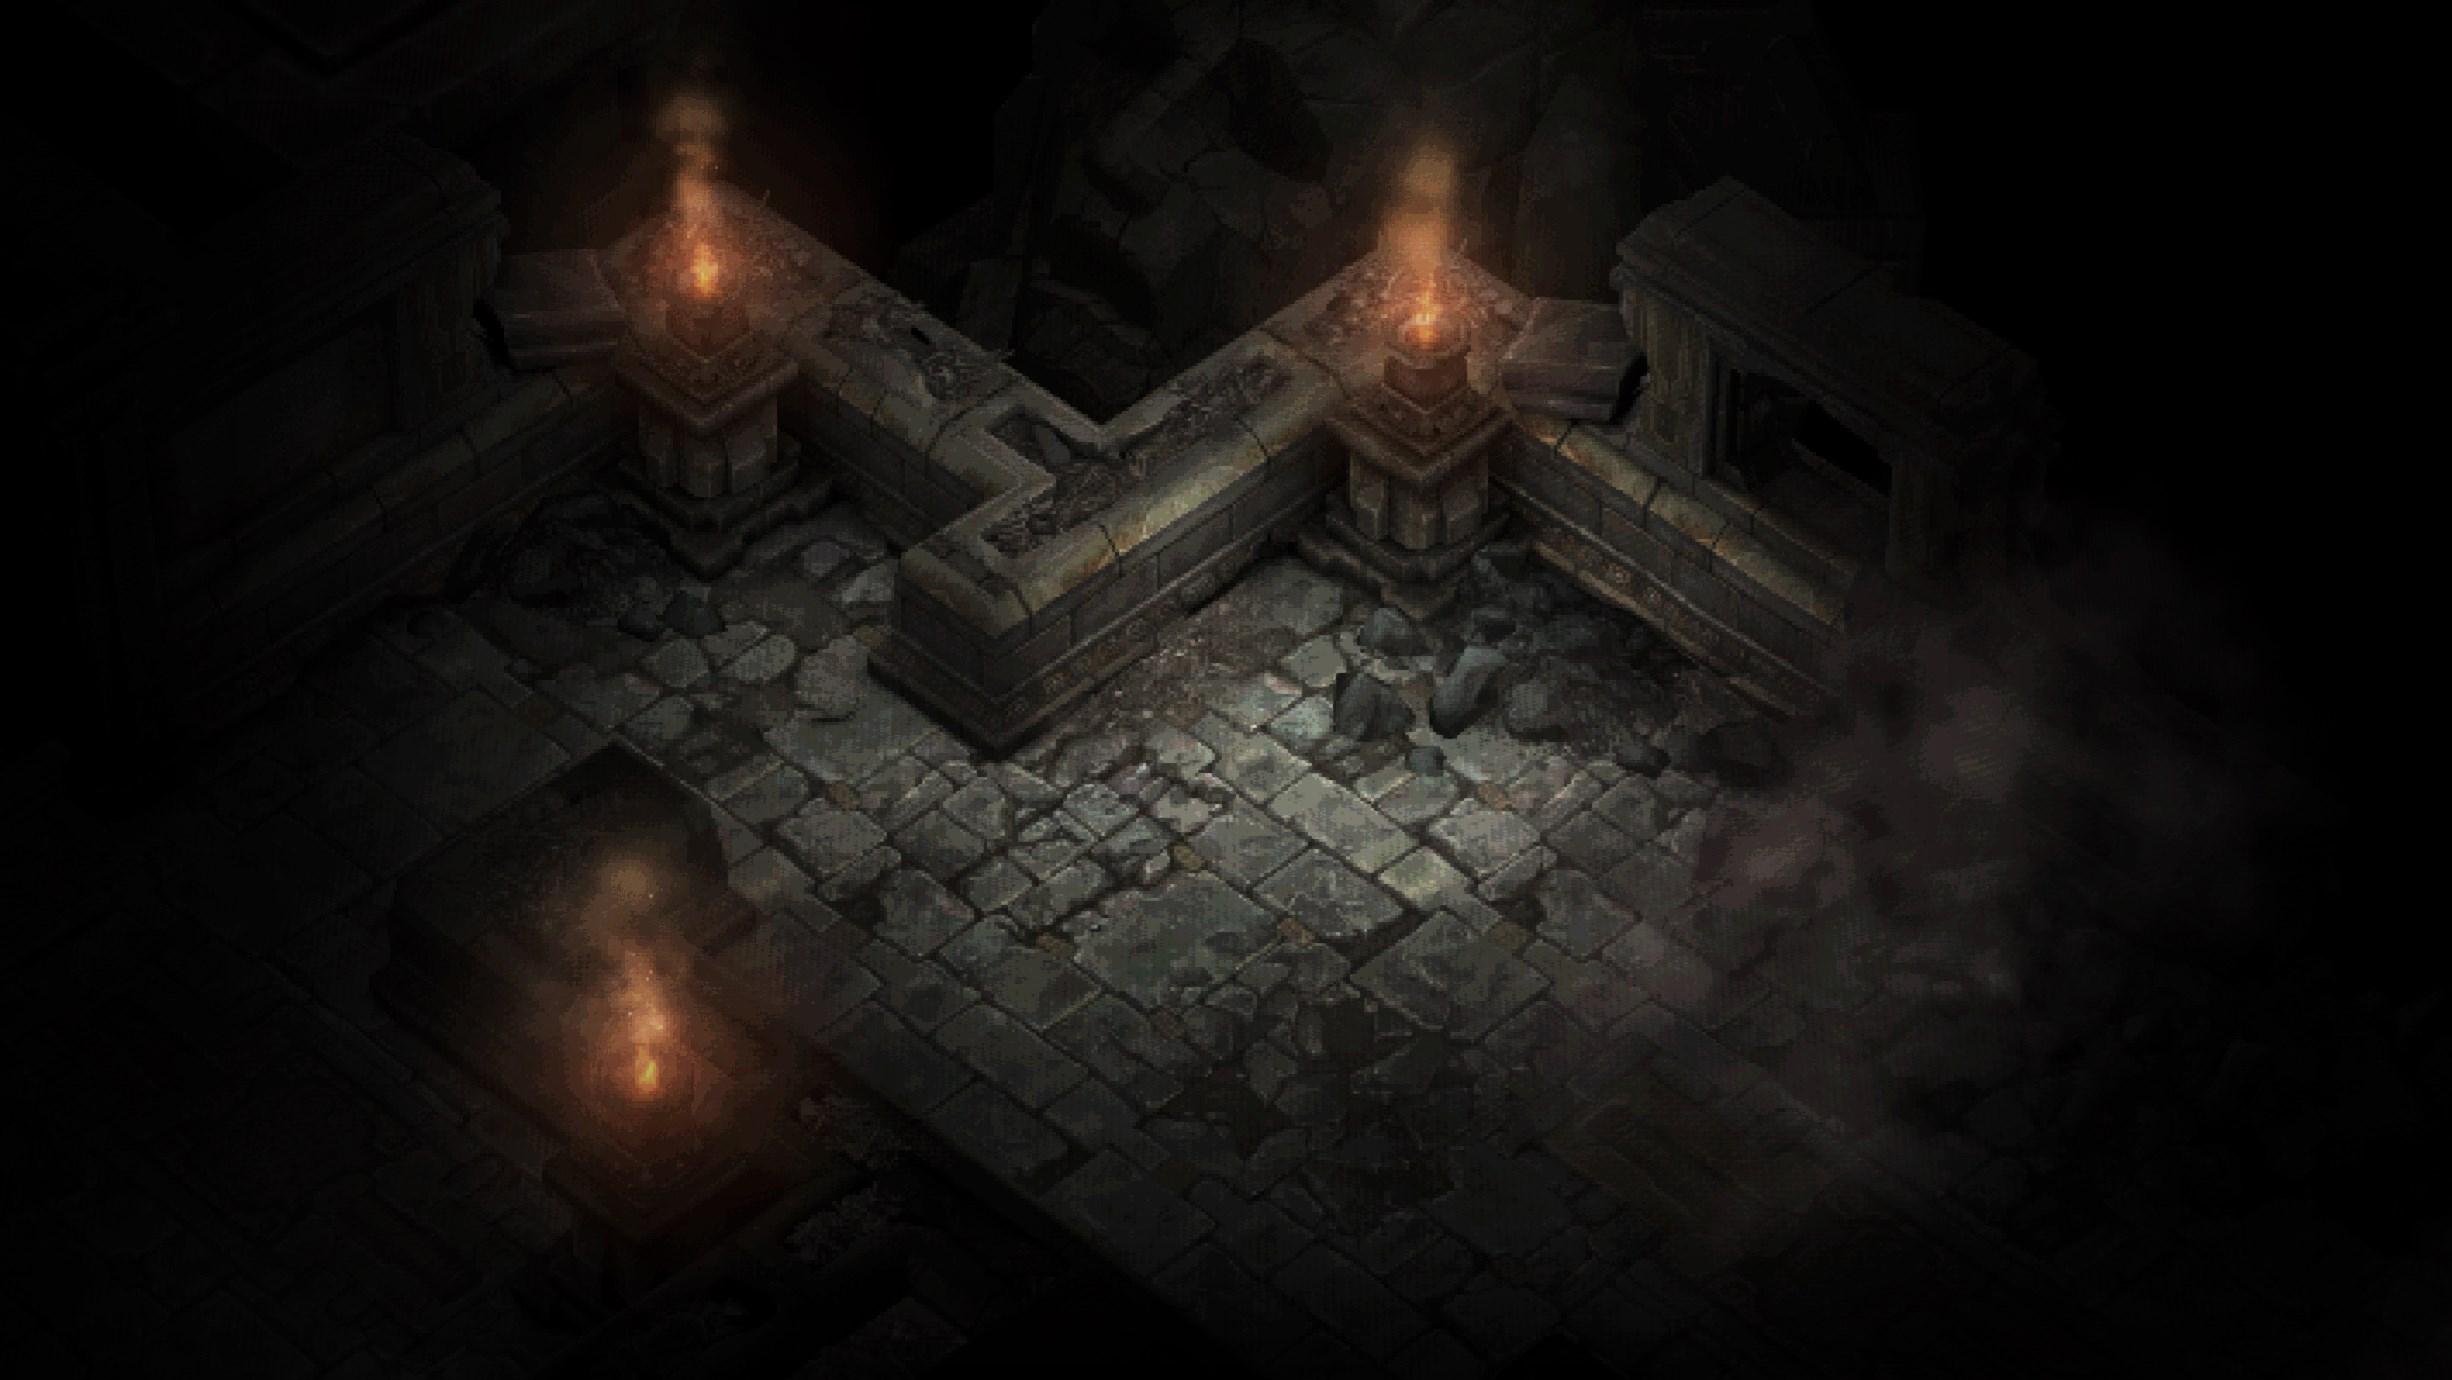 Diablo 3 The Darkening of Tristram - Catacombes